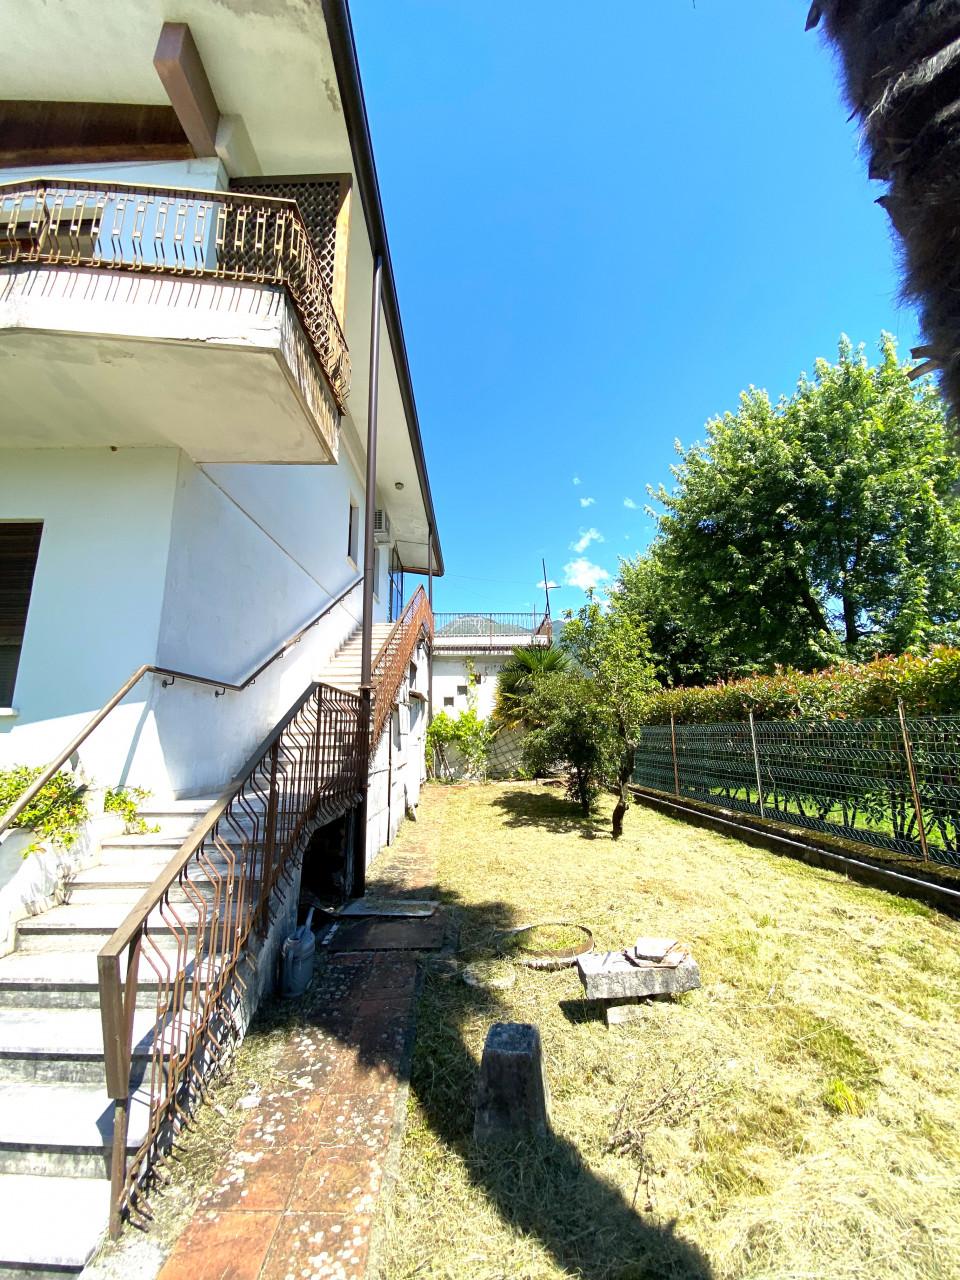 Casa singola con capannone in vendita in centro a Budoia - Rif. V.D.1 https://images.gestionaleimmobiliare.it/foto/annunci/200702/2265893/1280x1280/020__img_2969.jpg